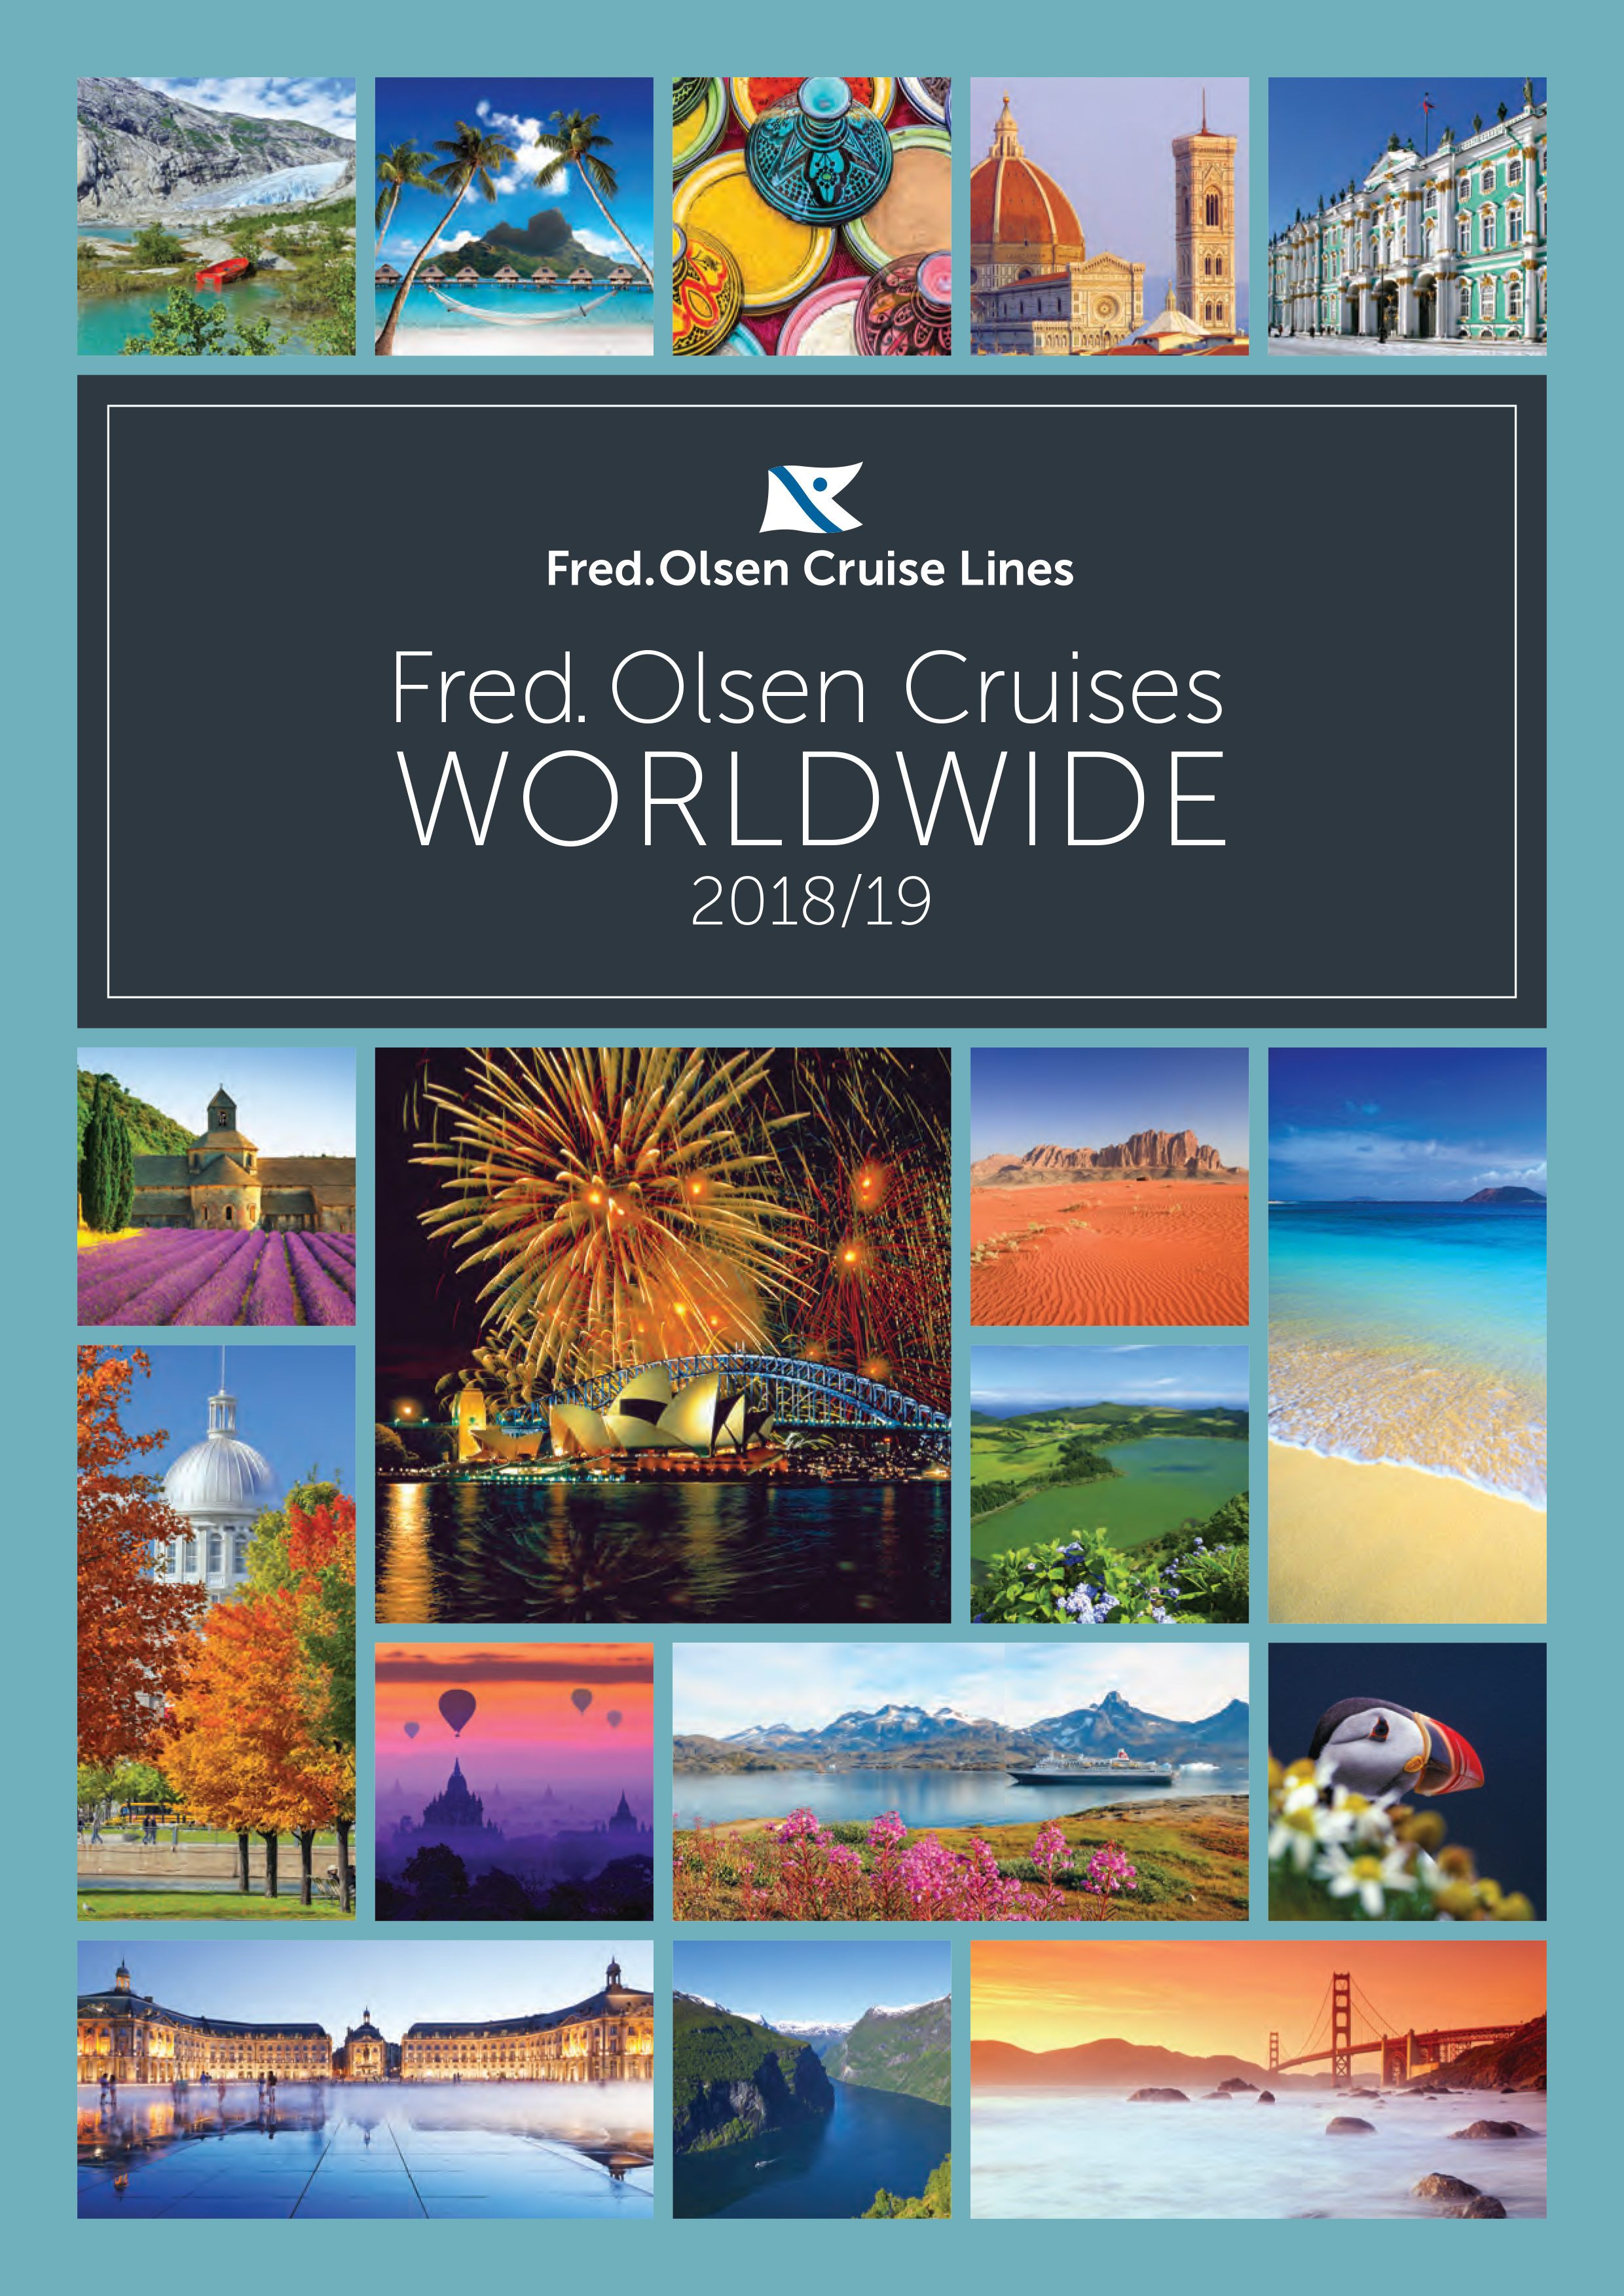 Fred. Olsen's 2018/19 brochure launch